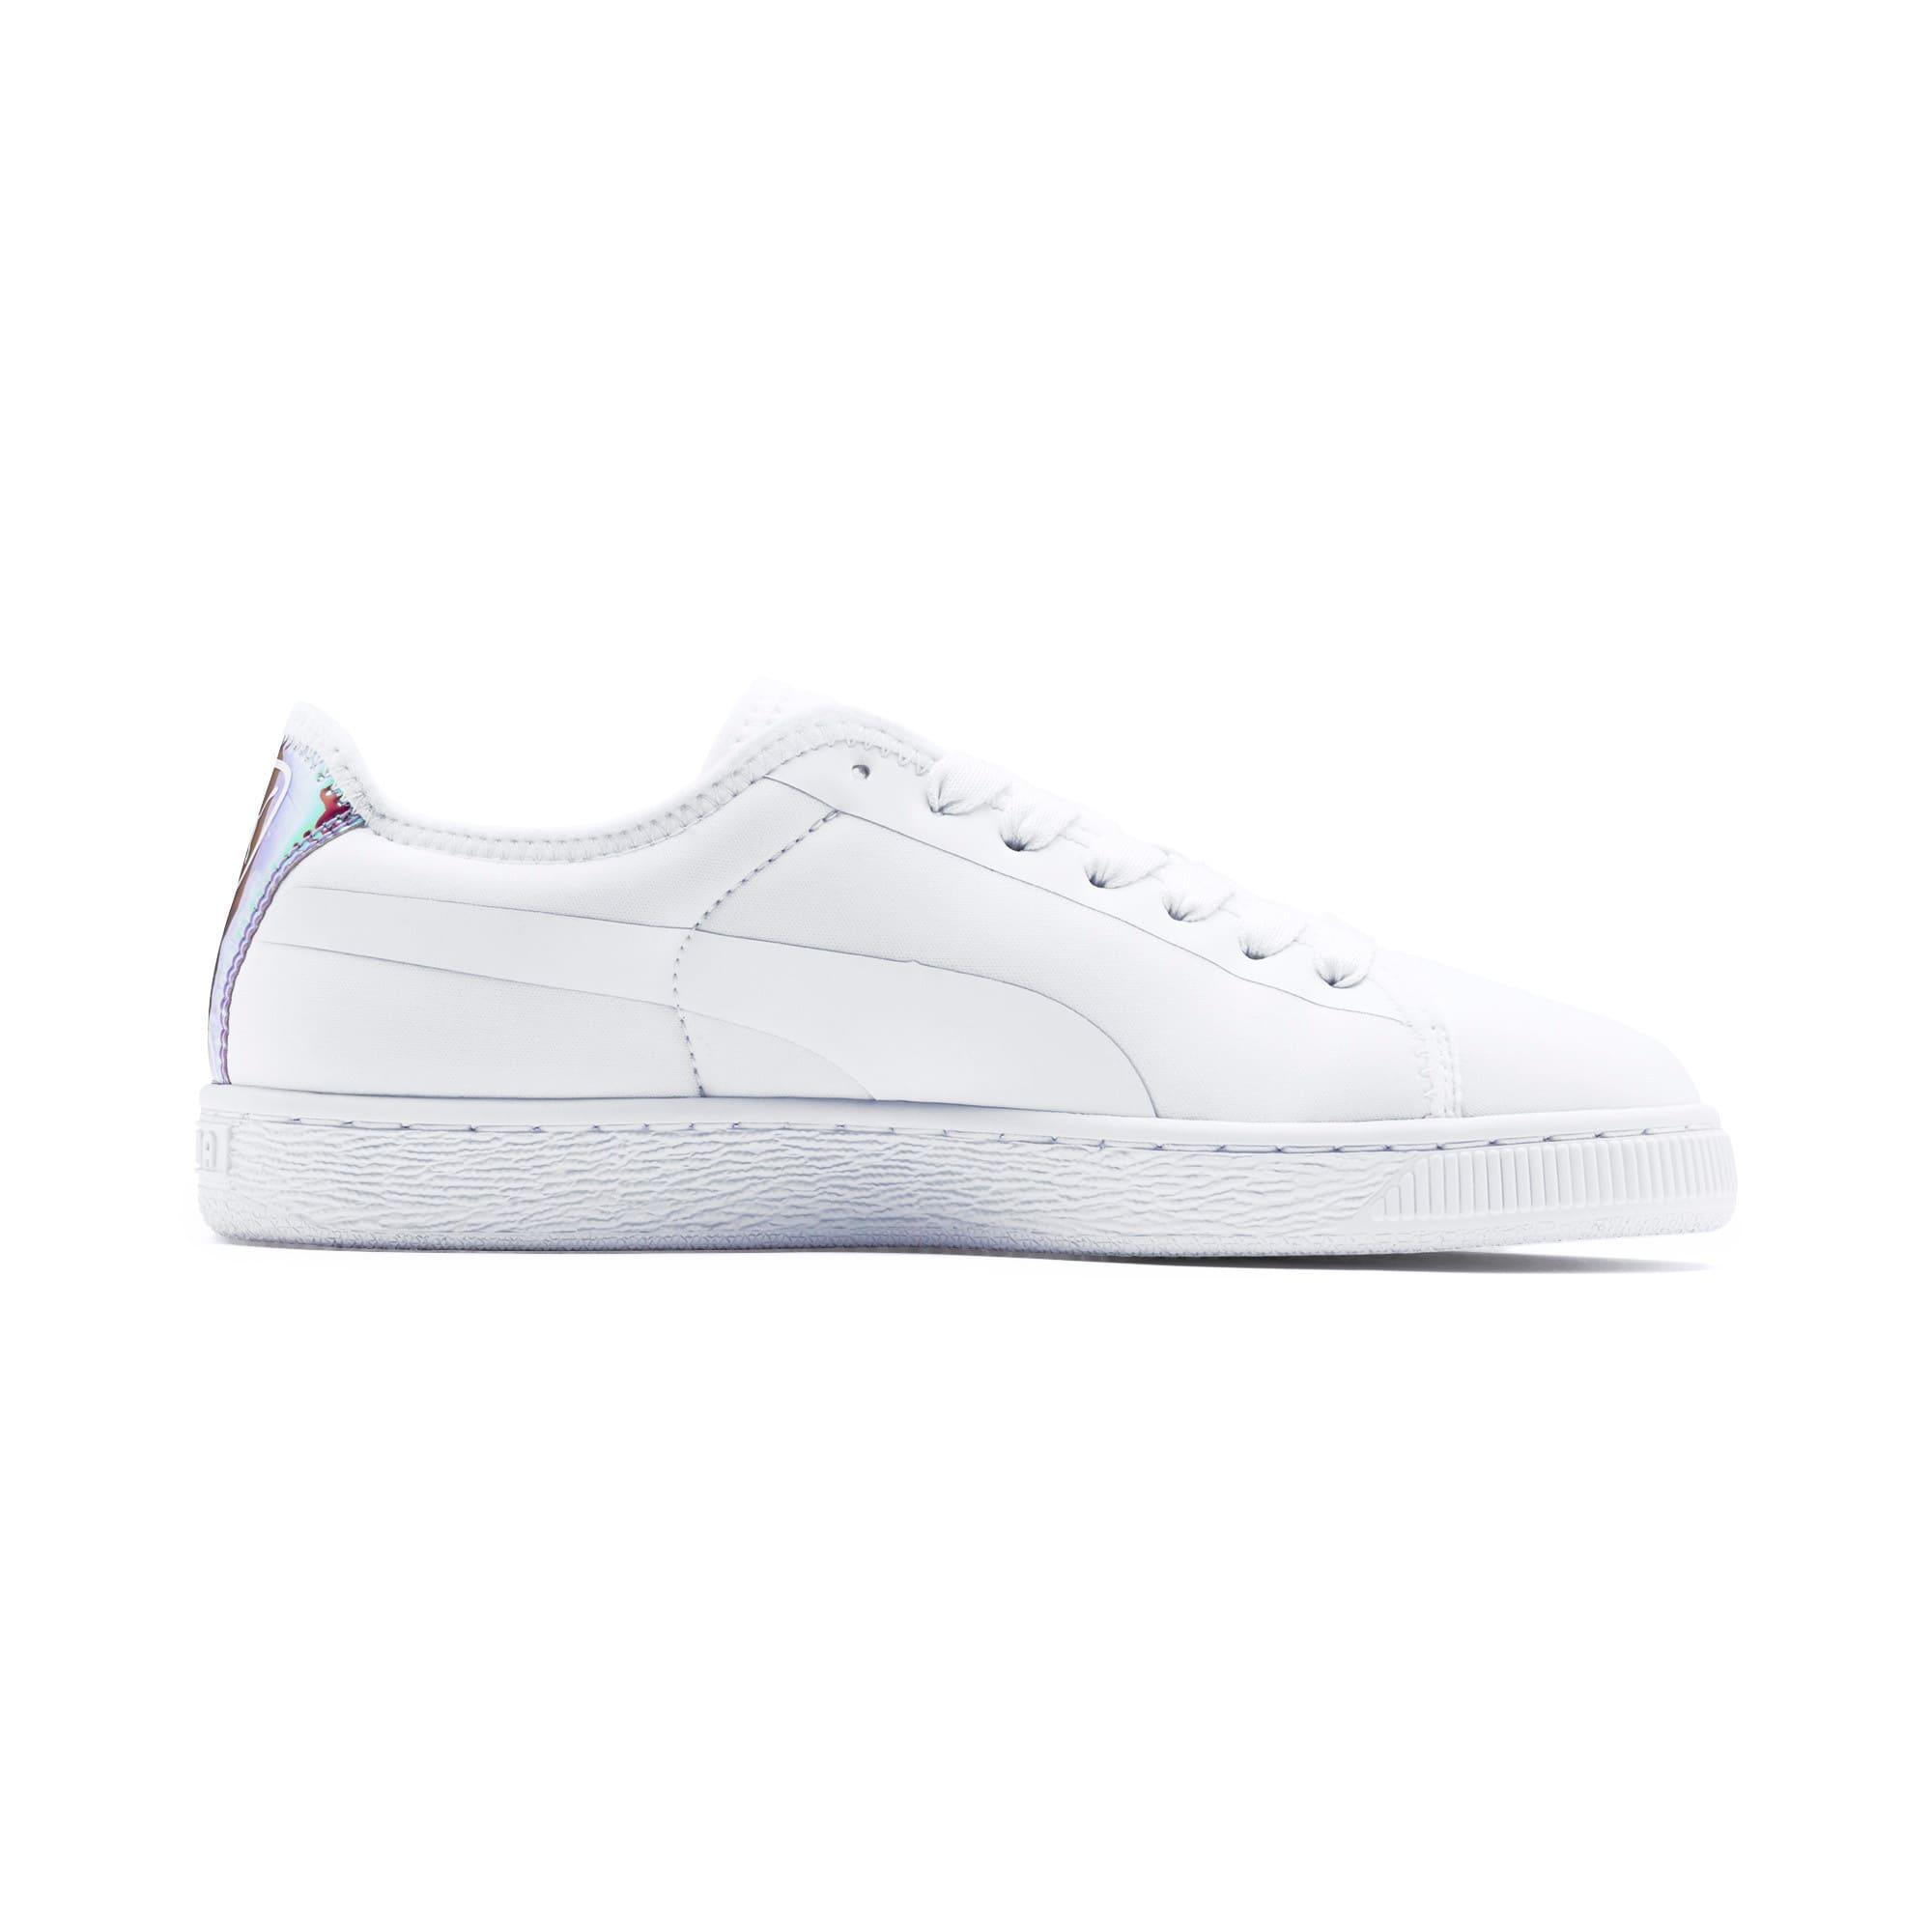 Miniatura 5 de Zapatos deportivos  Basket Trailblazerpara mujer, Puma White-Fuchsia Purple, mediano